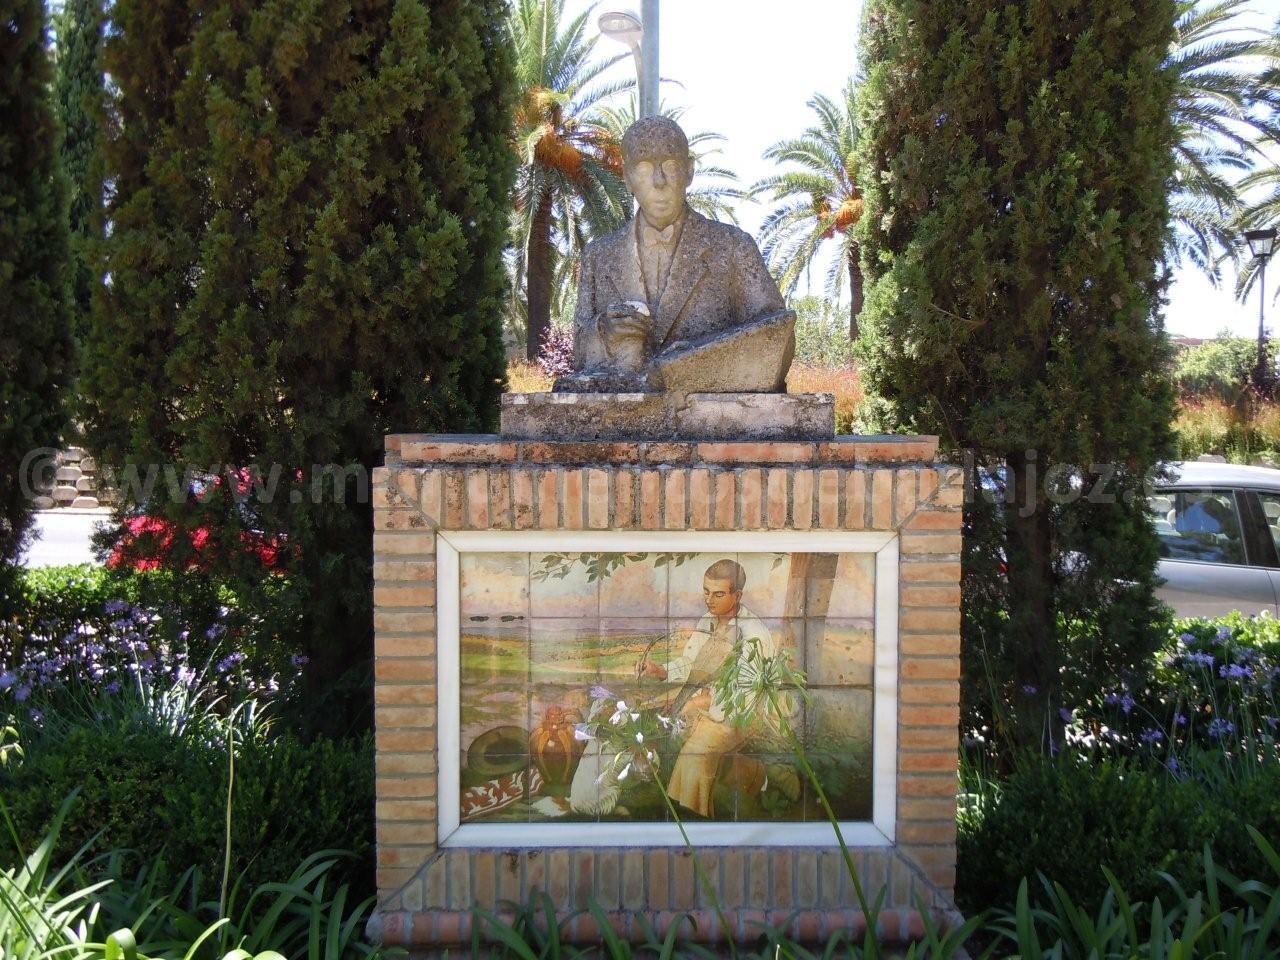 Busto de Adelardo Covarsí.  Parque de Castelar.  Badajoz